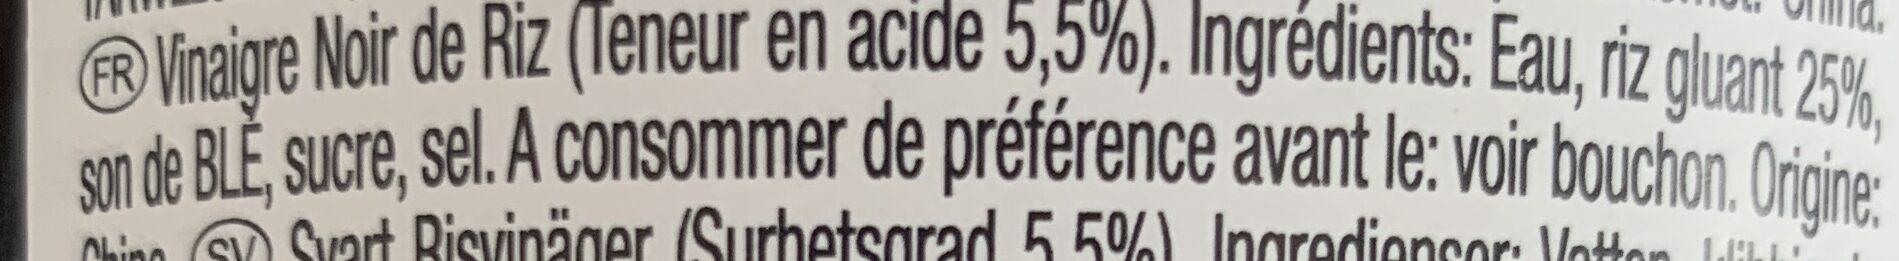 Vinaigre noir de riz - Ingredienti - fr